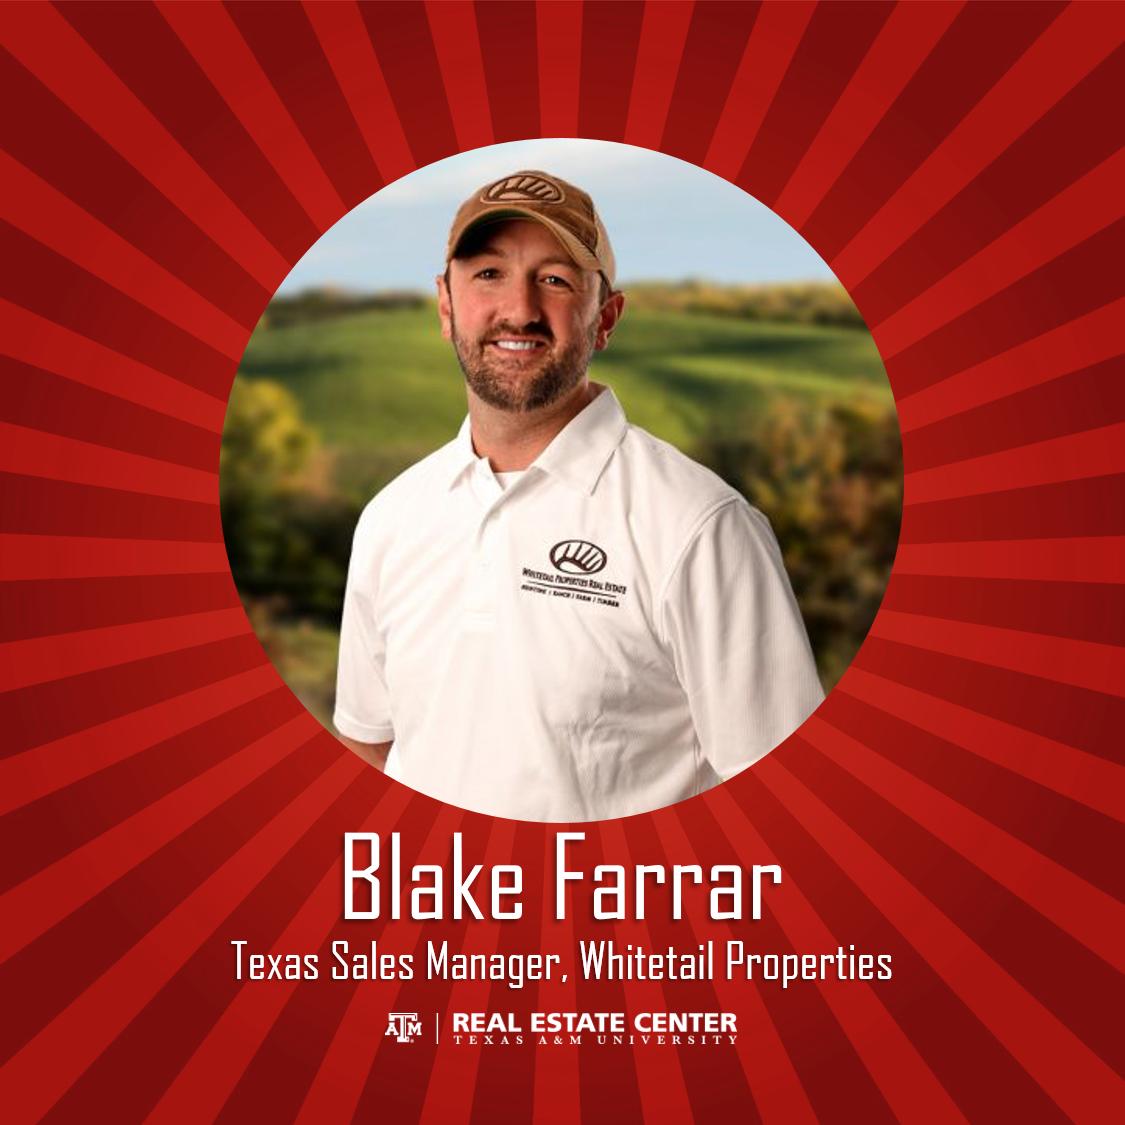 Blake Farrar headshot